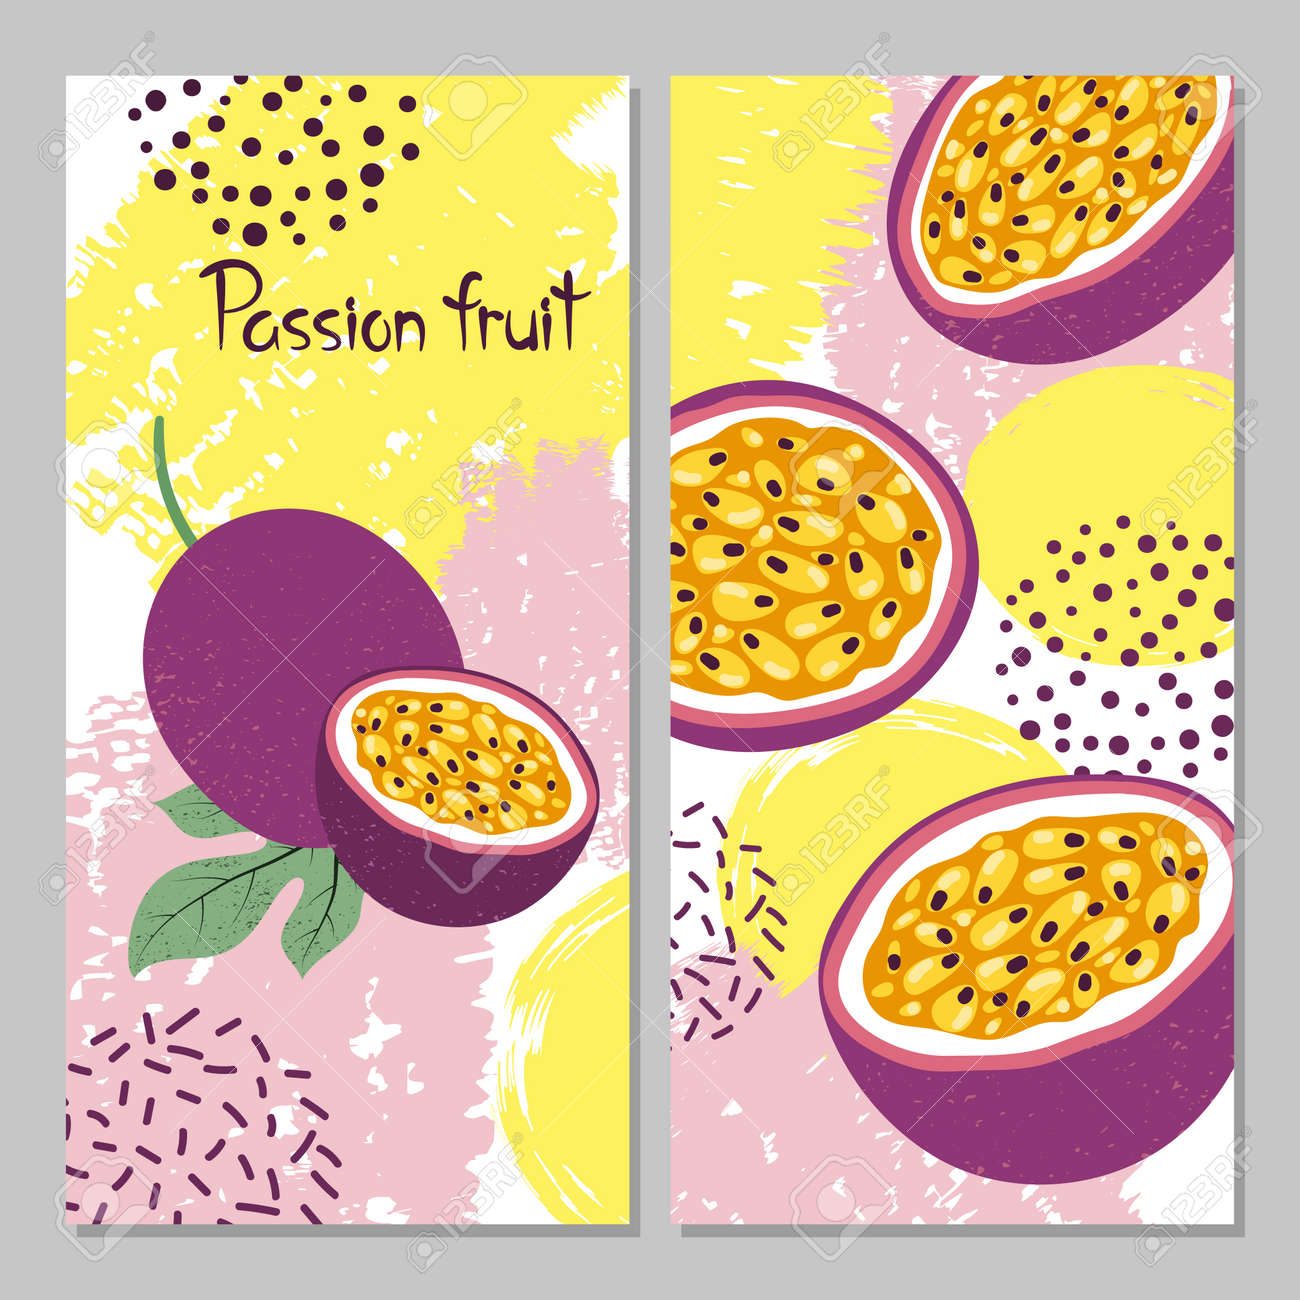 Passion fruit vector illustration. Bright summer print. - 116862330